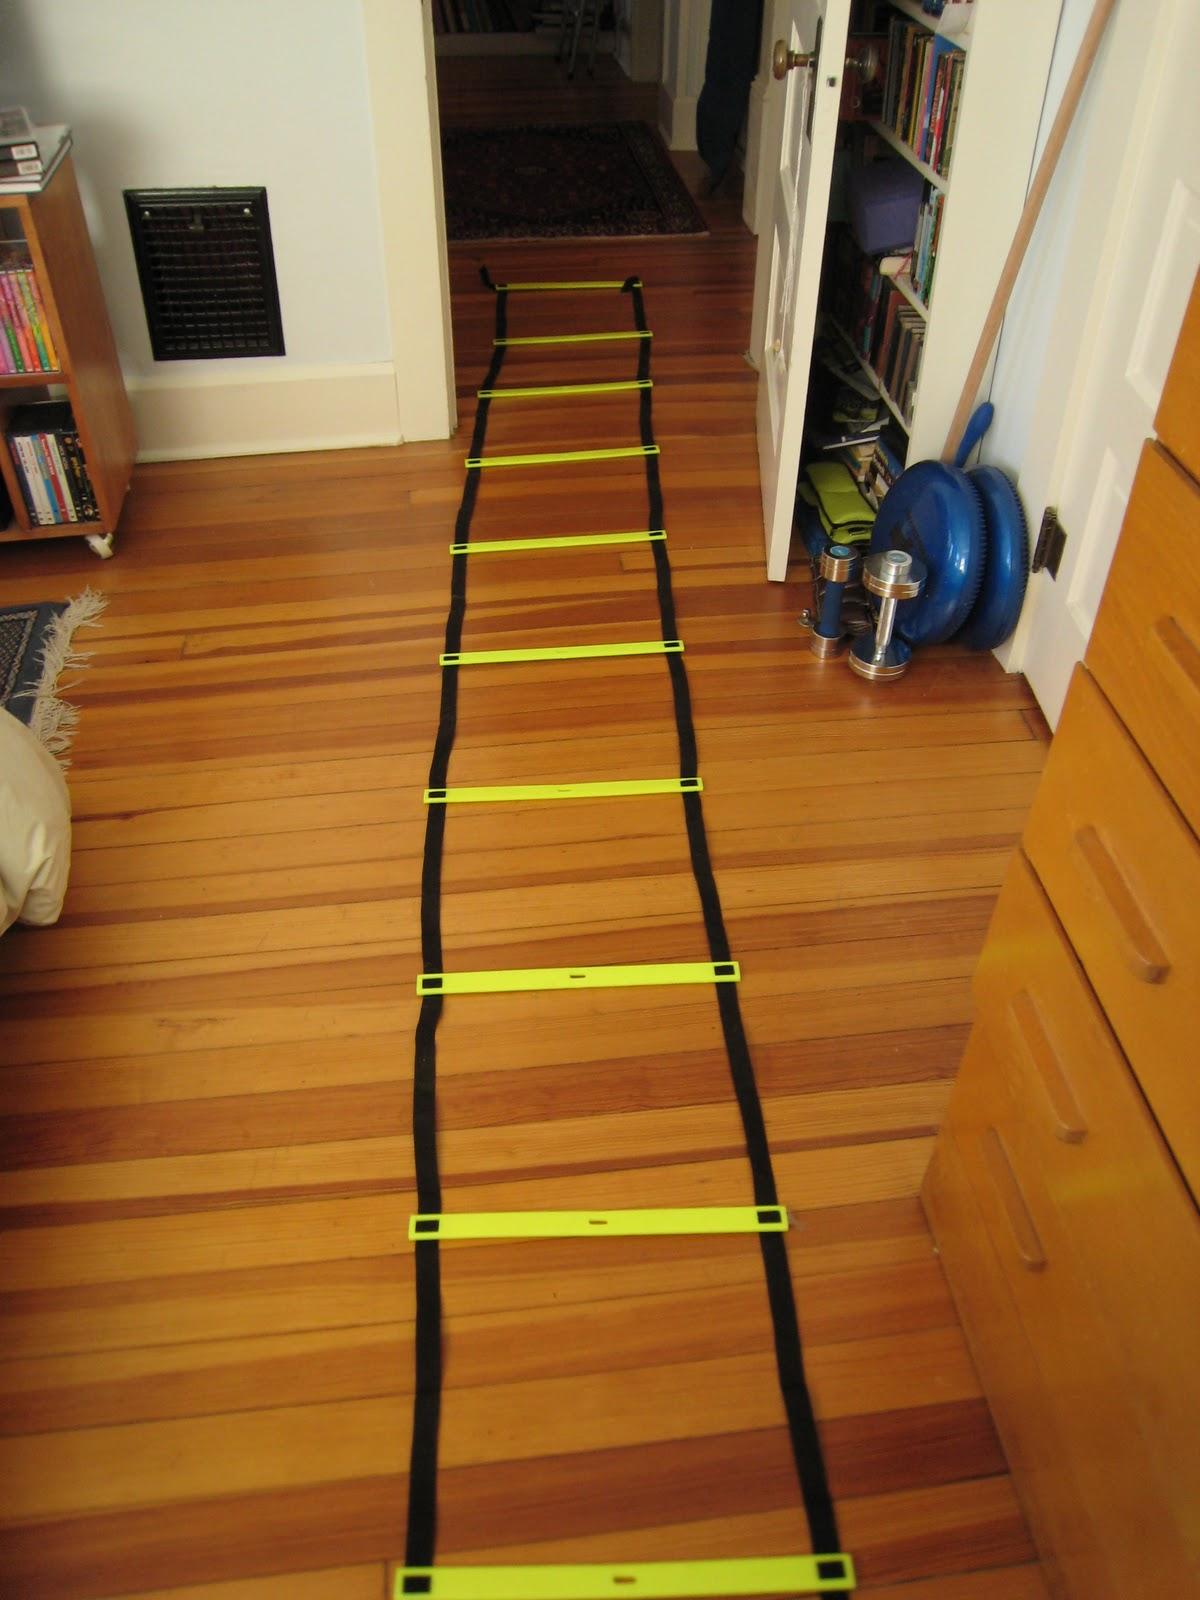 Plyometric exercises ladder drills effective